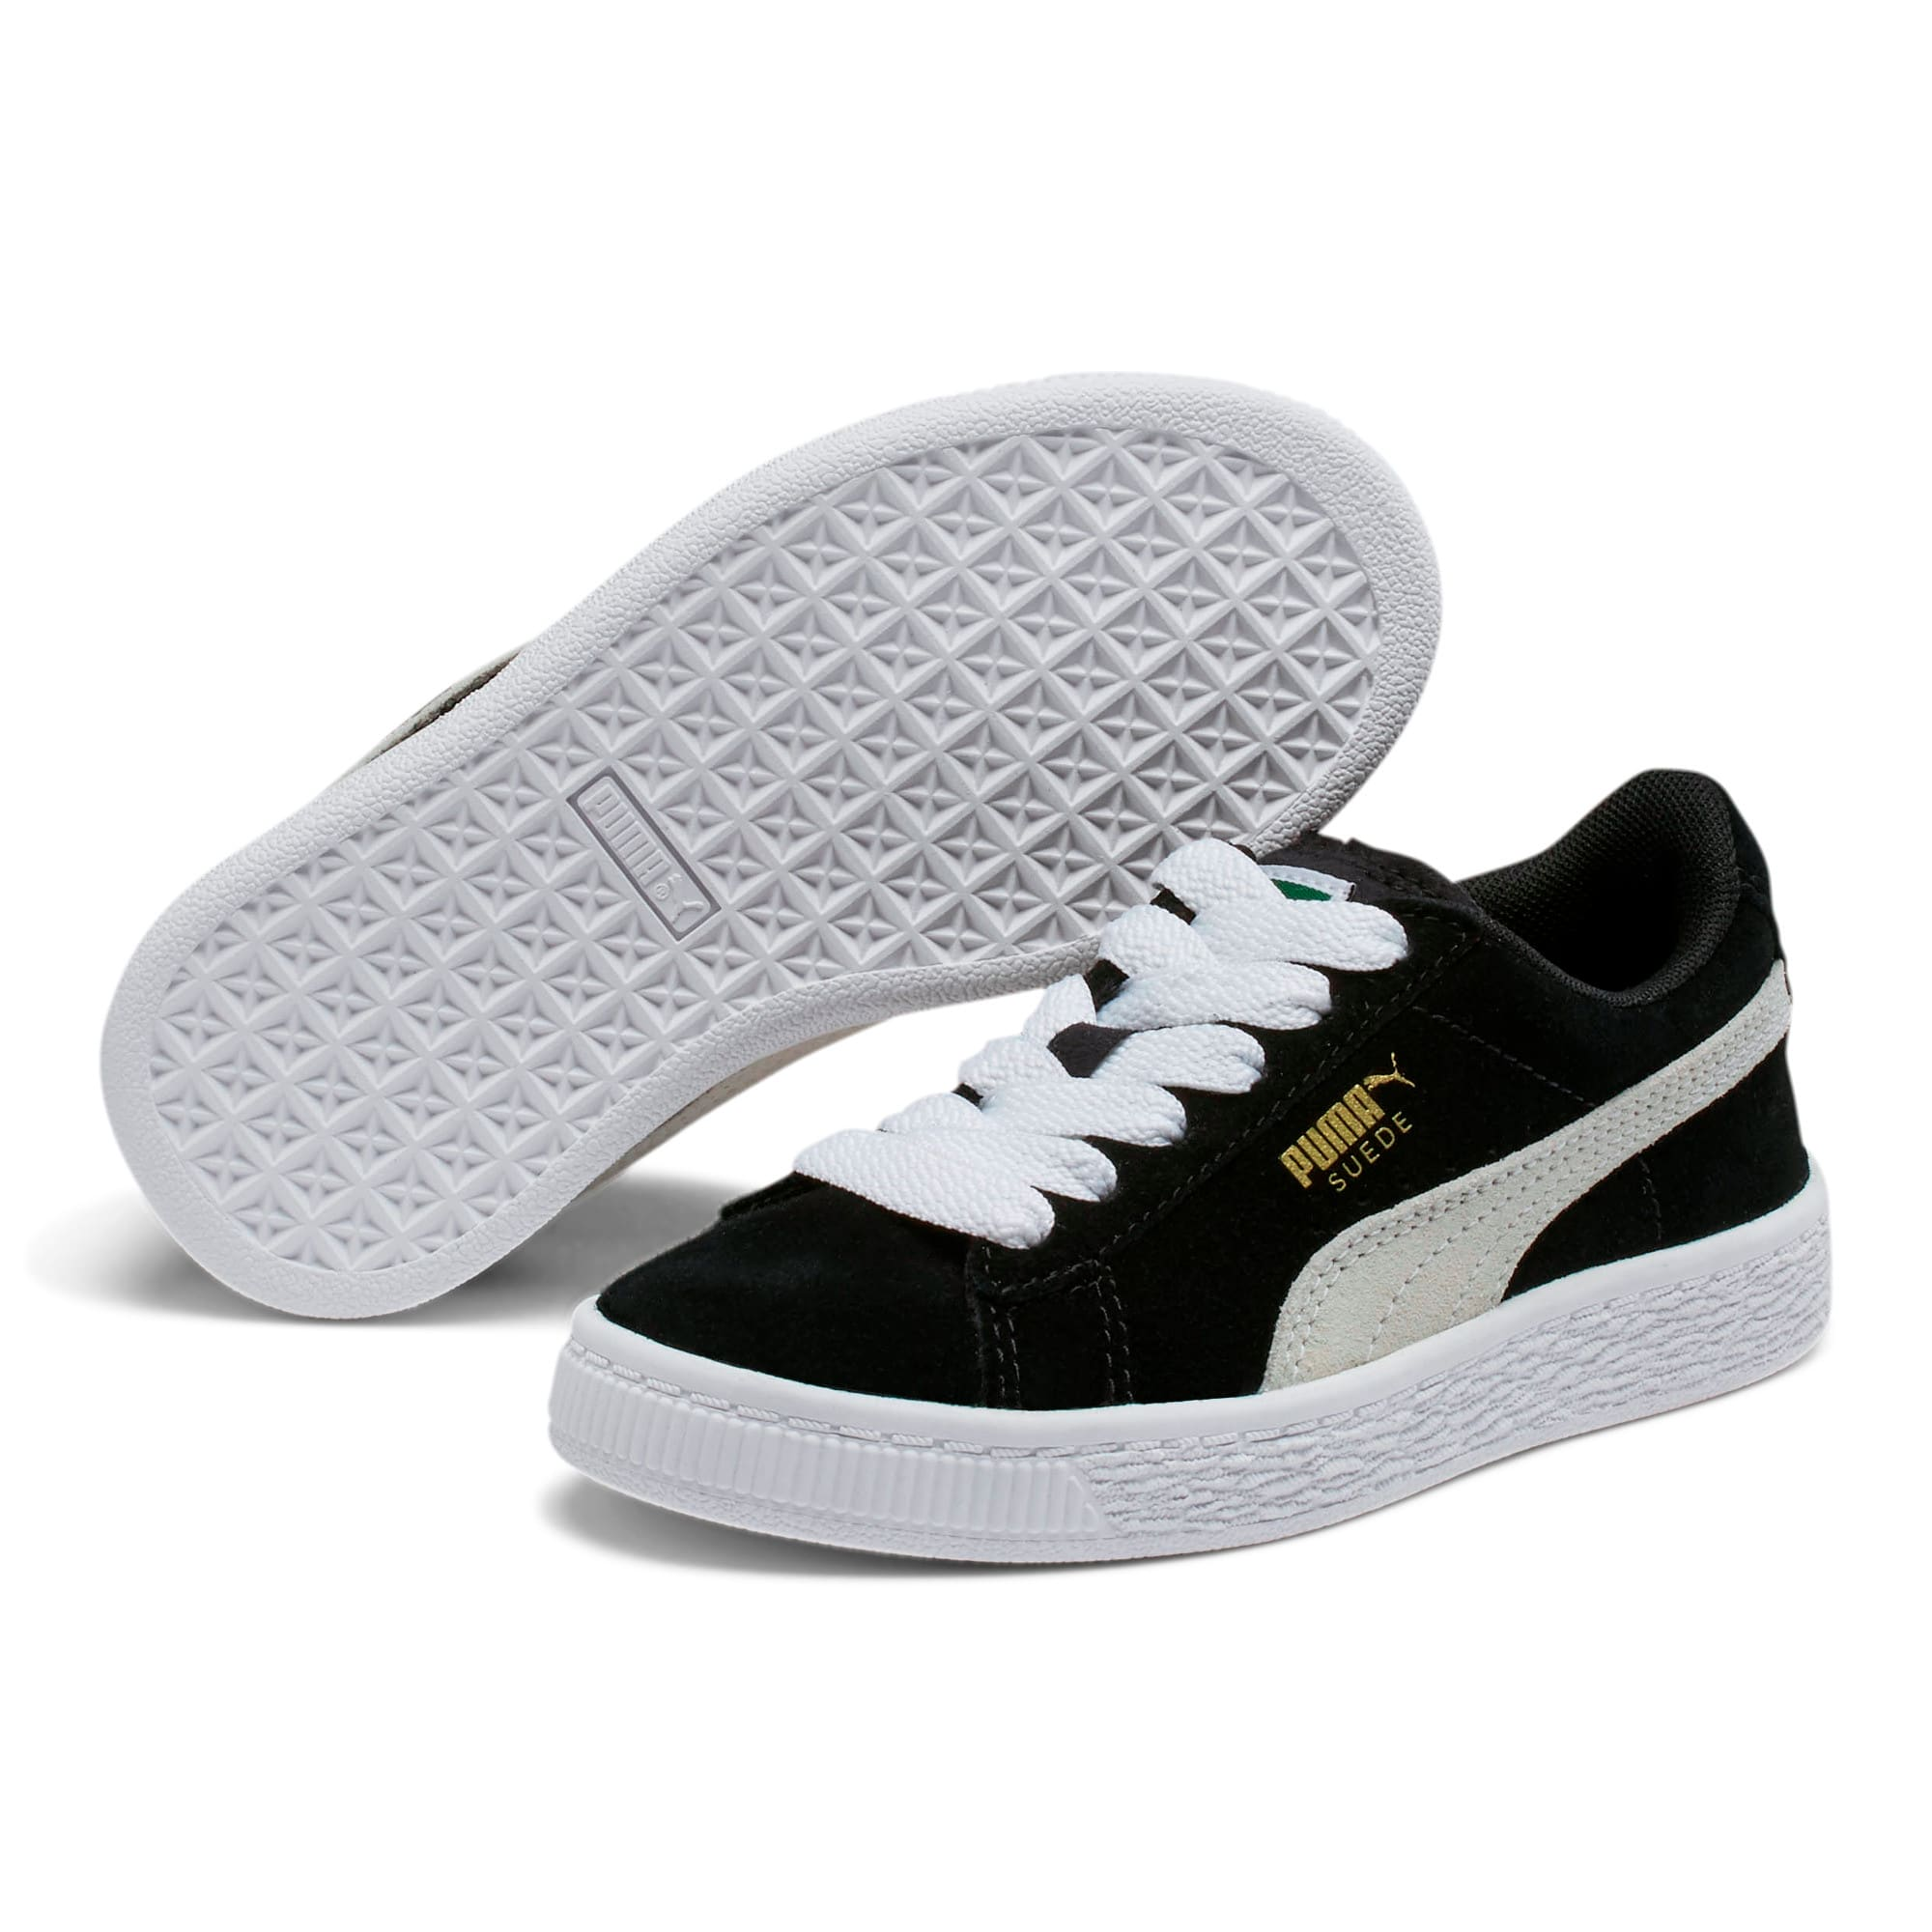 Thumbnail 2 of Suede Little Kids' Shoes, Puma Black-Puma White, medium